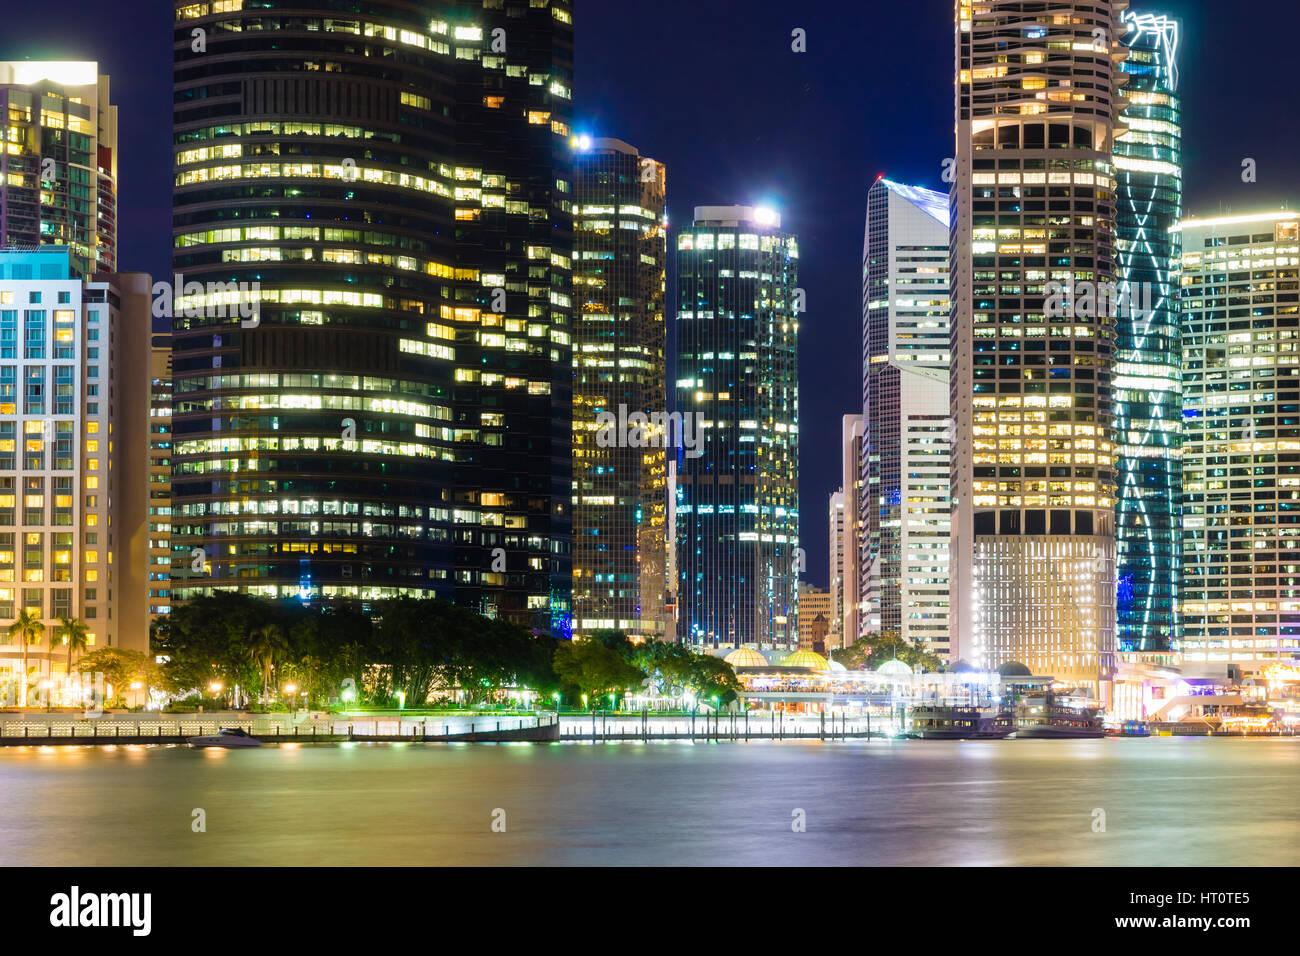 Close-up view of Brisbane city skyline at night - Stock Image